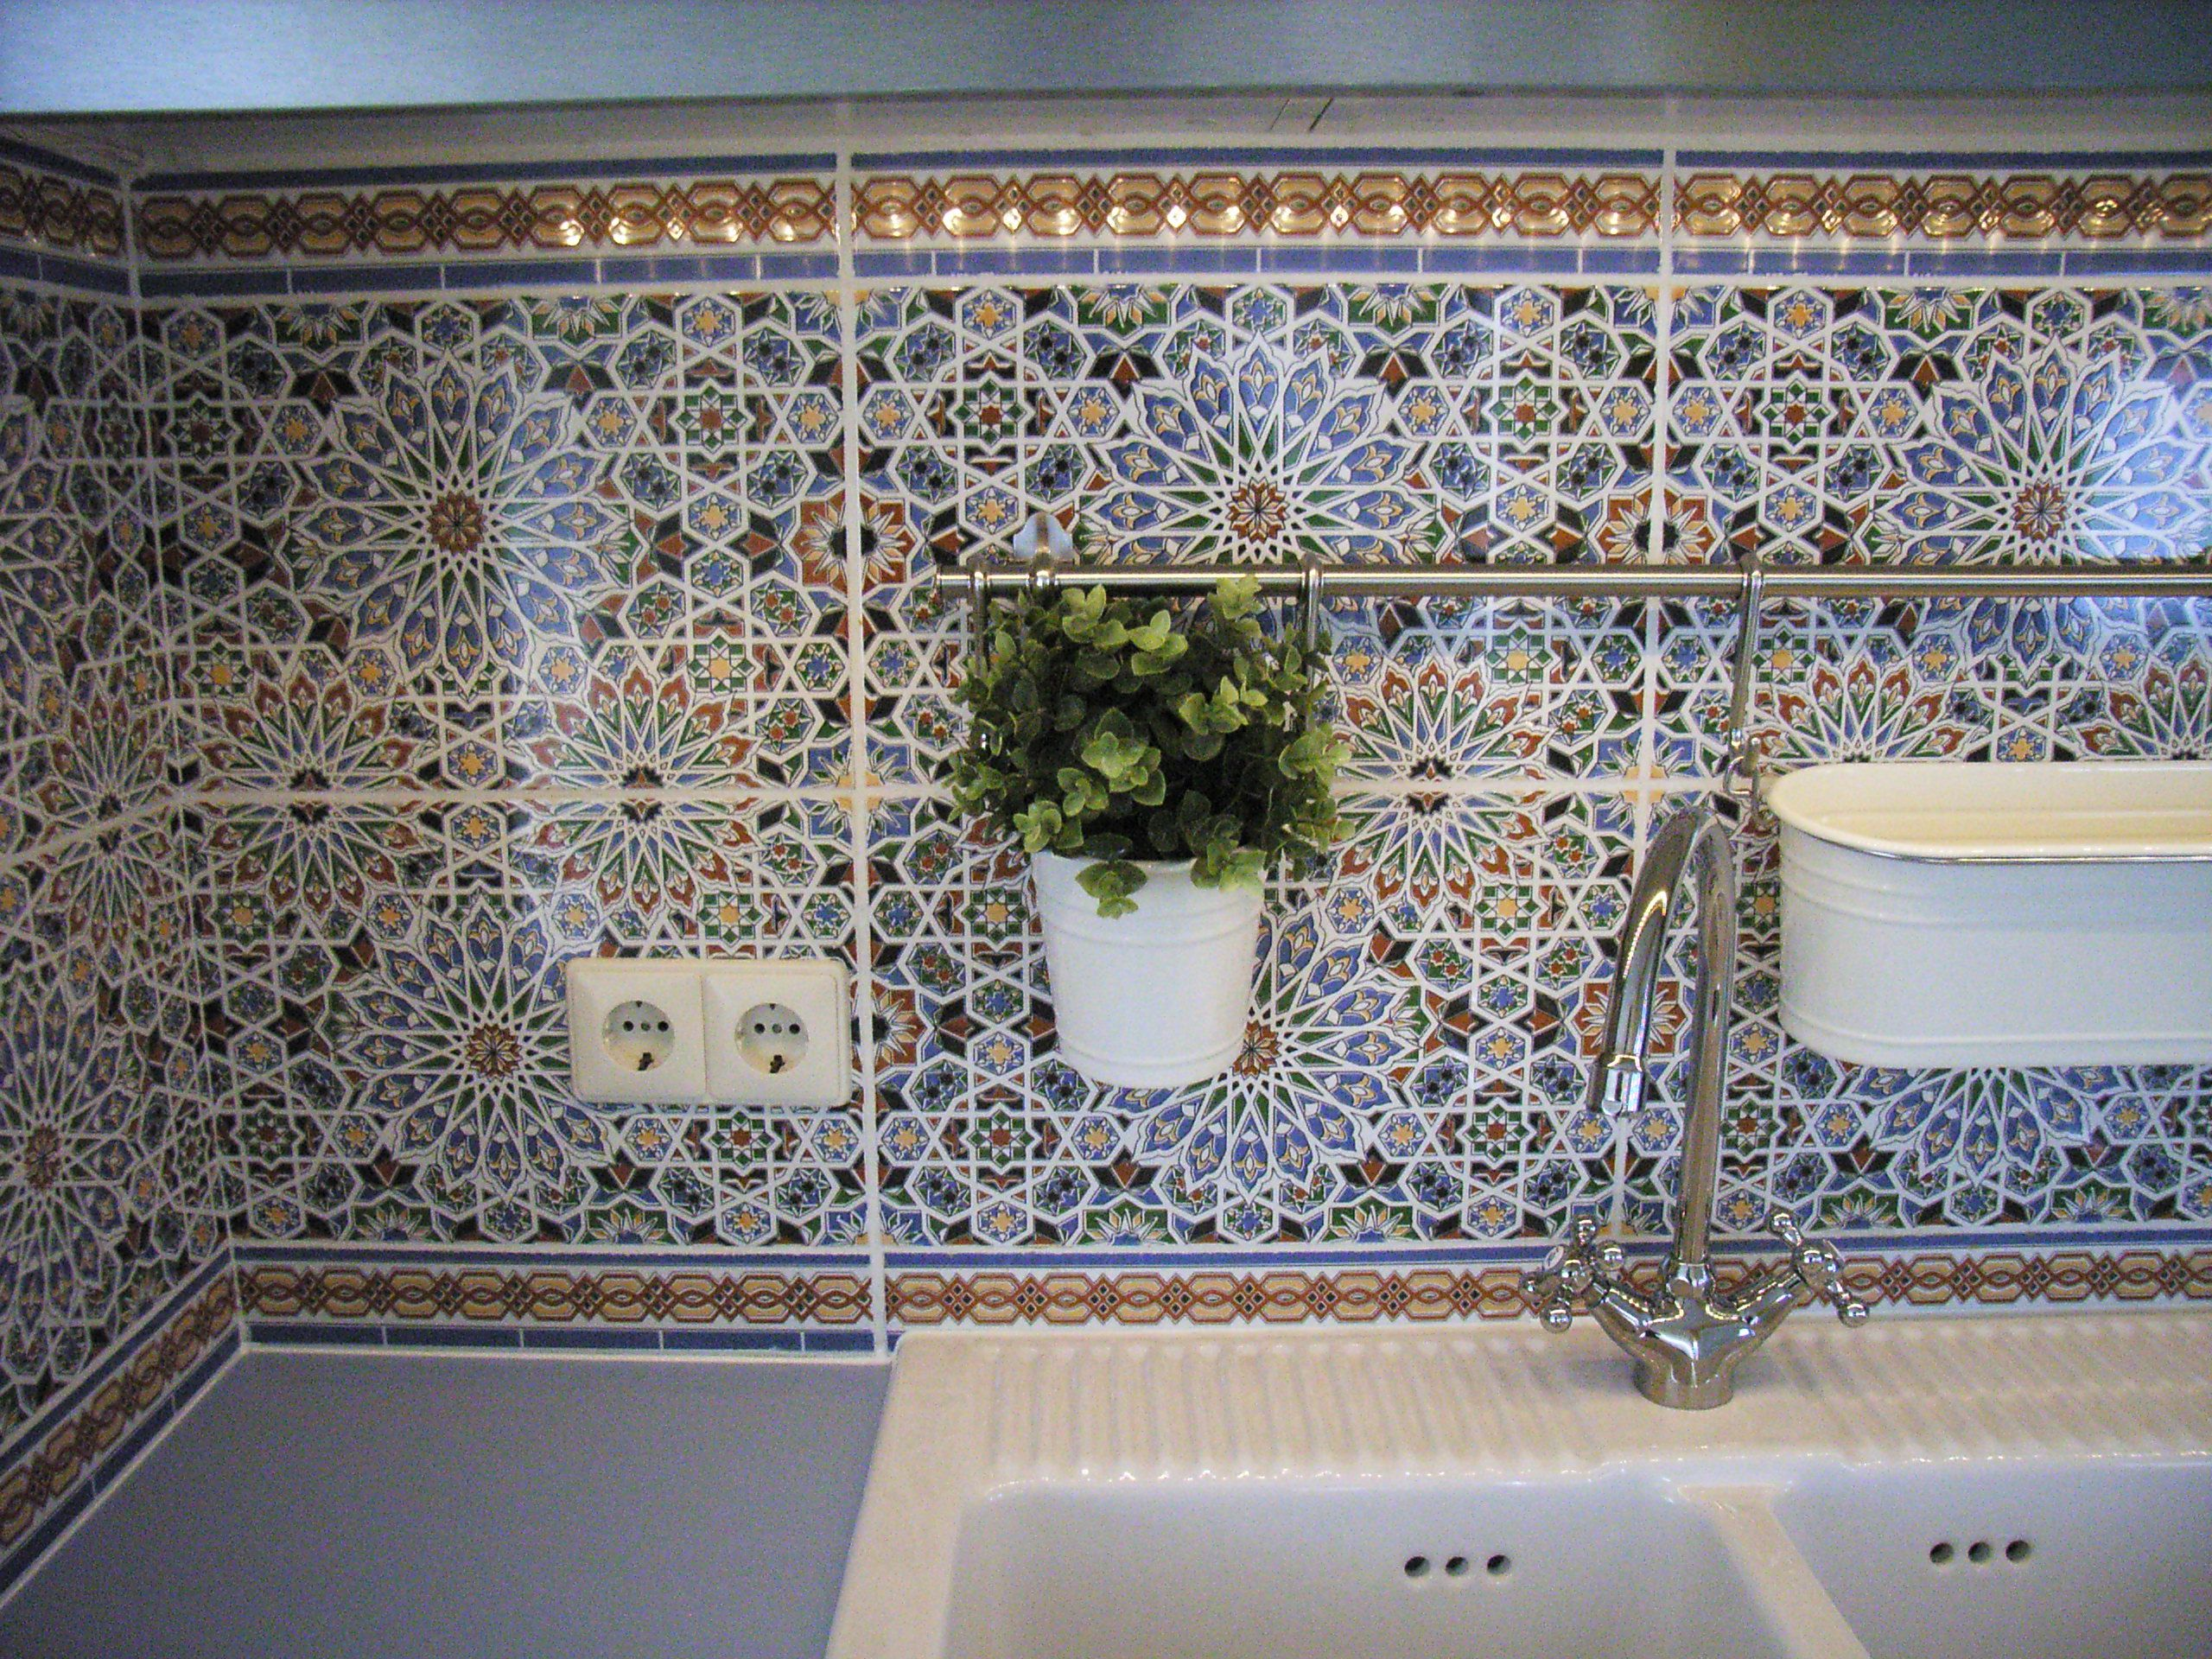 hammam badkamer - Google zoeken | Badkamer | Pinterest